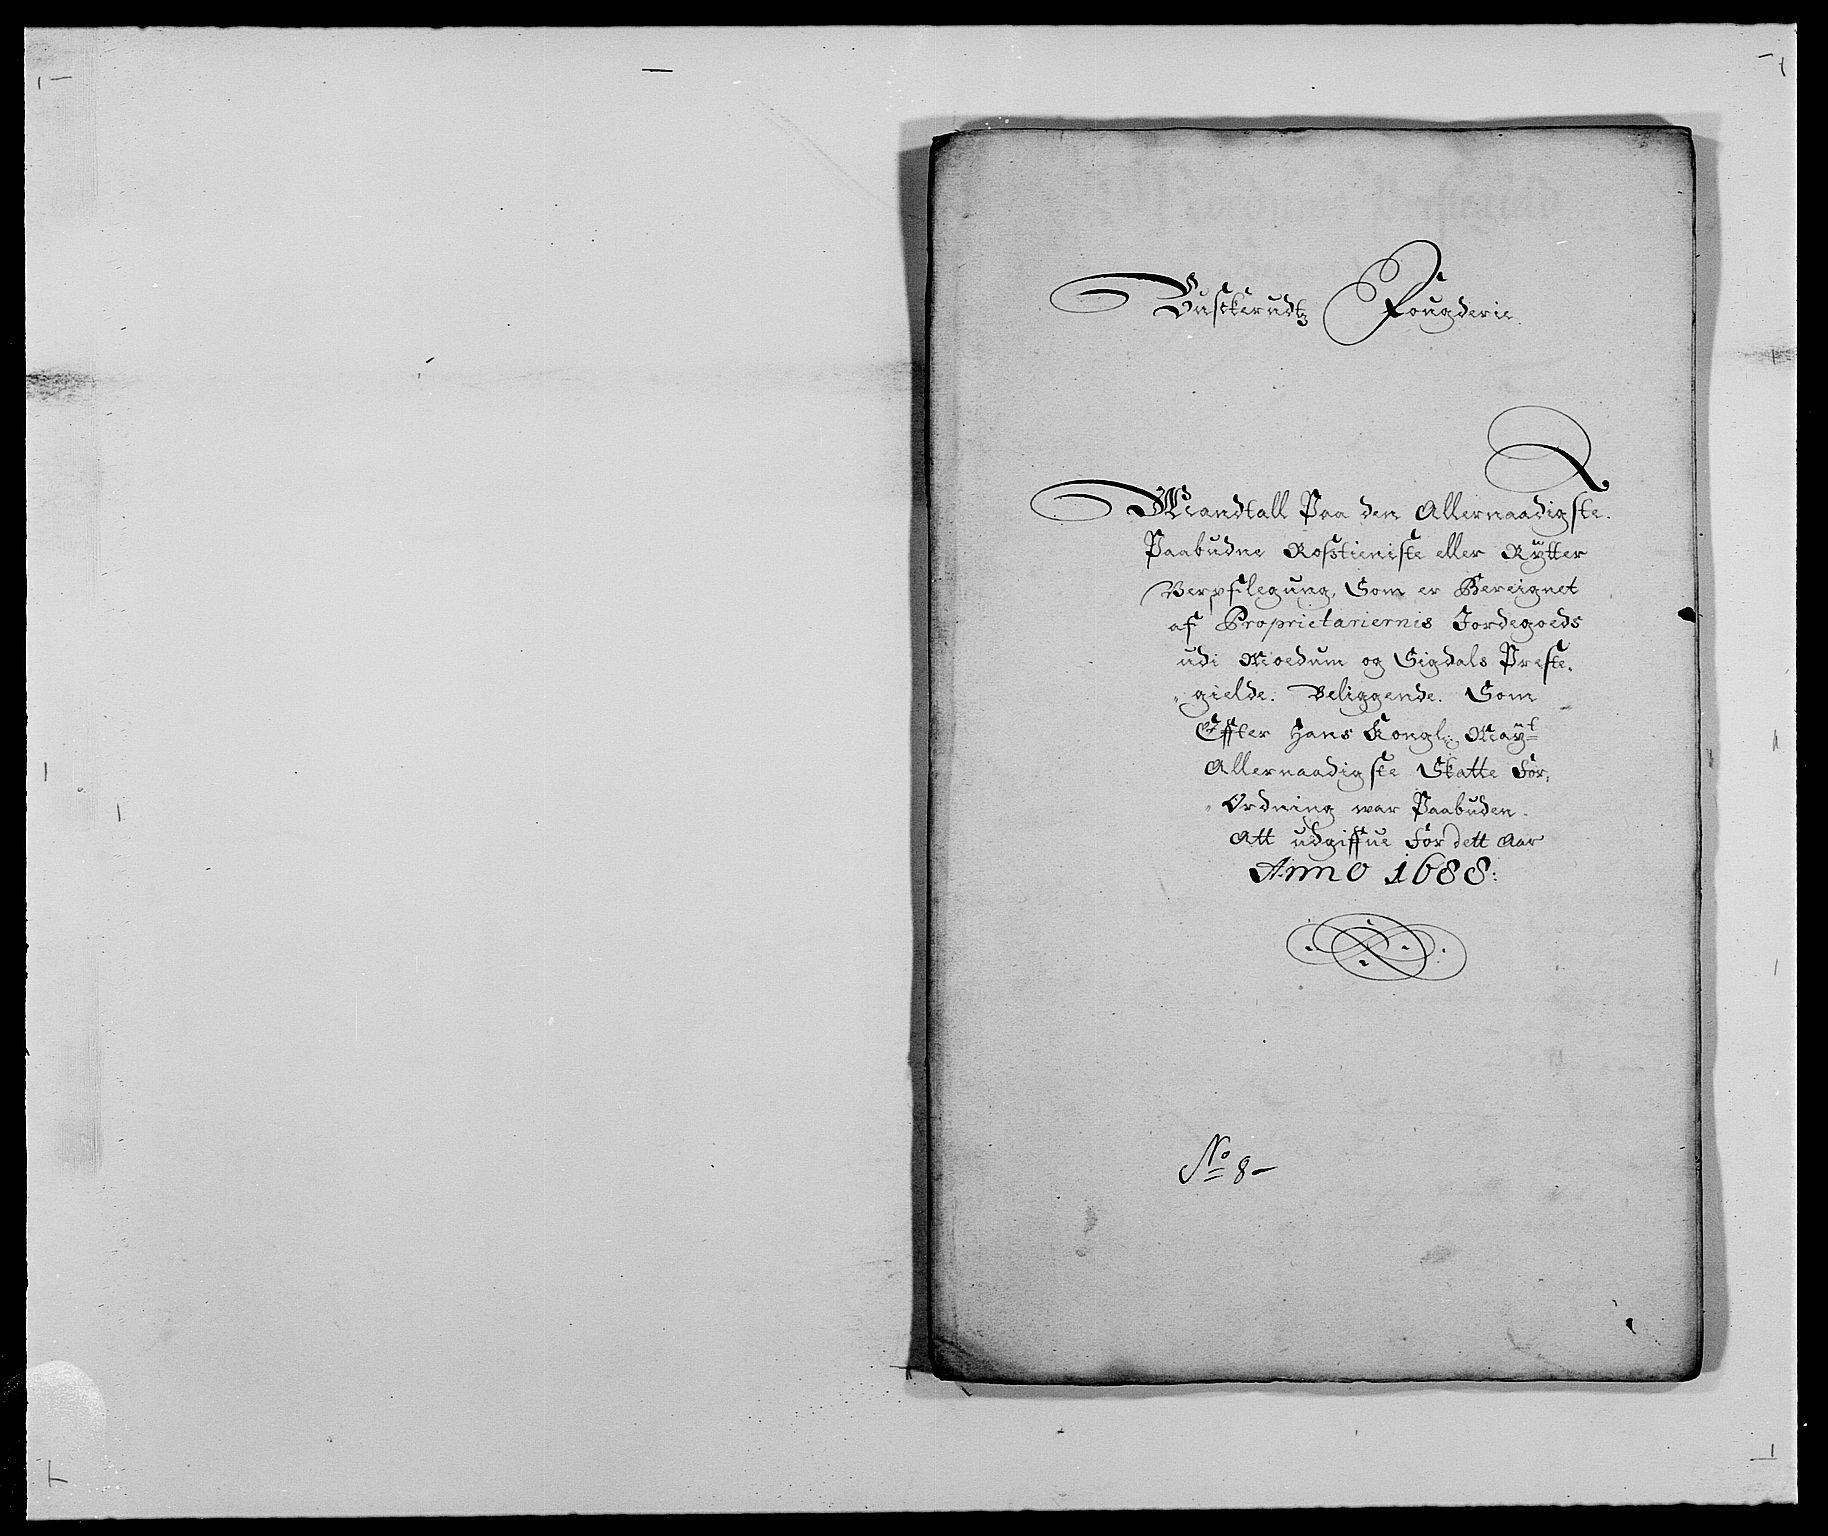 RA, Rentekammeret inntil 1814, Reviderte regnskaper, Fogderegnskap, R25/L1679: Fogderegnskap Buskerud, 1687-1688, s. 481